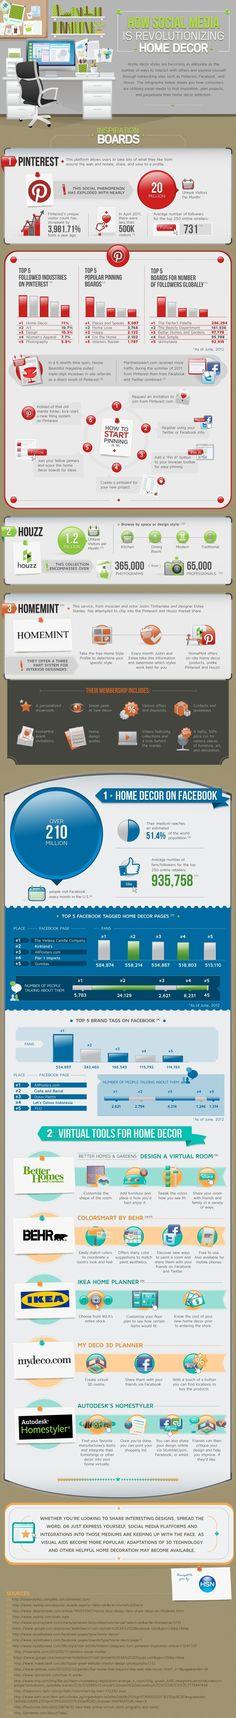 Social Media Has Revolutionized Home Decorating [INFOGRAPHIC]